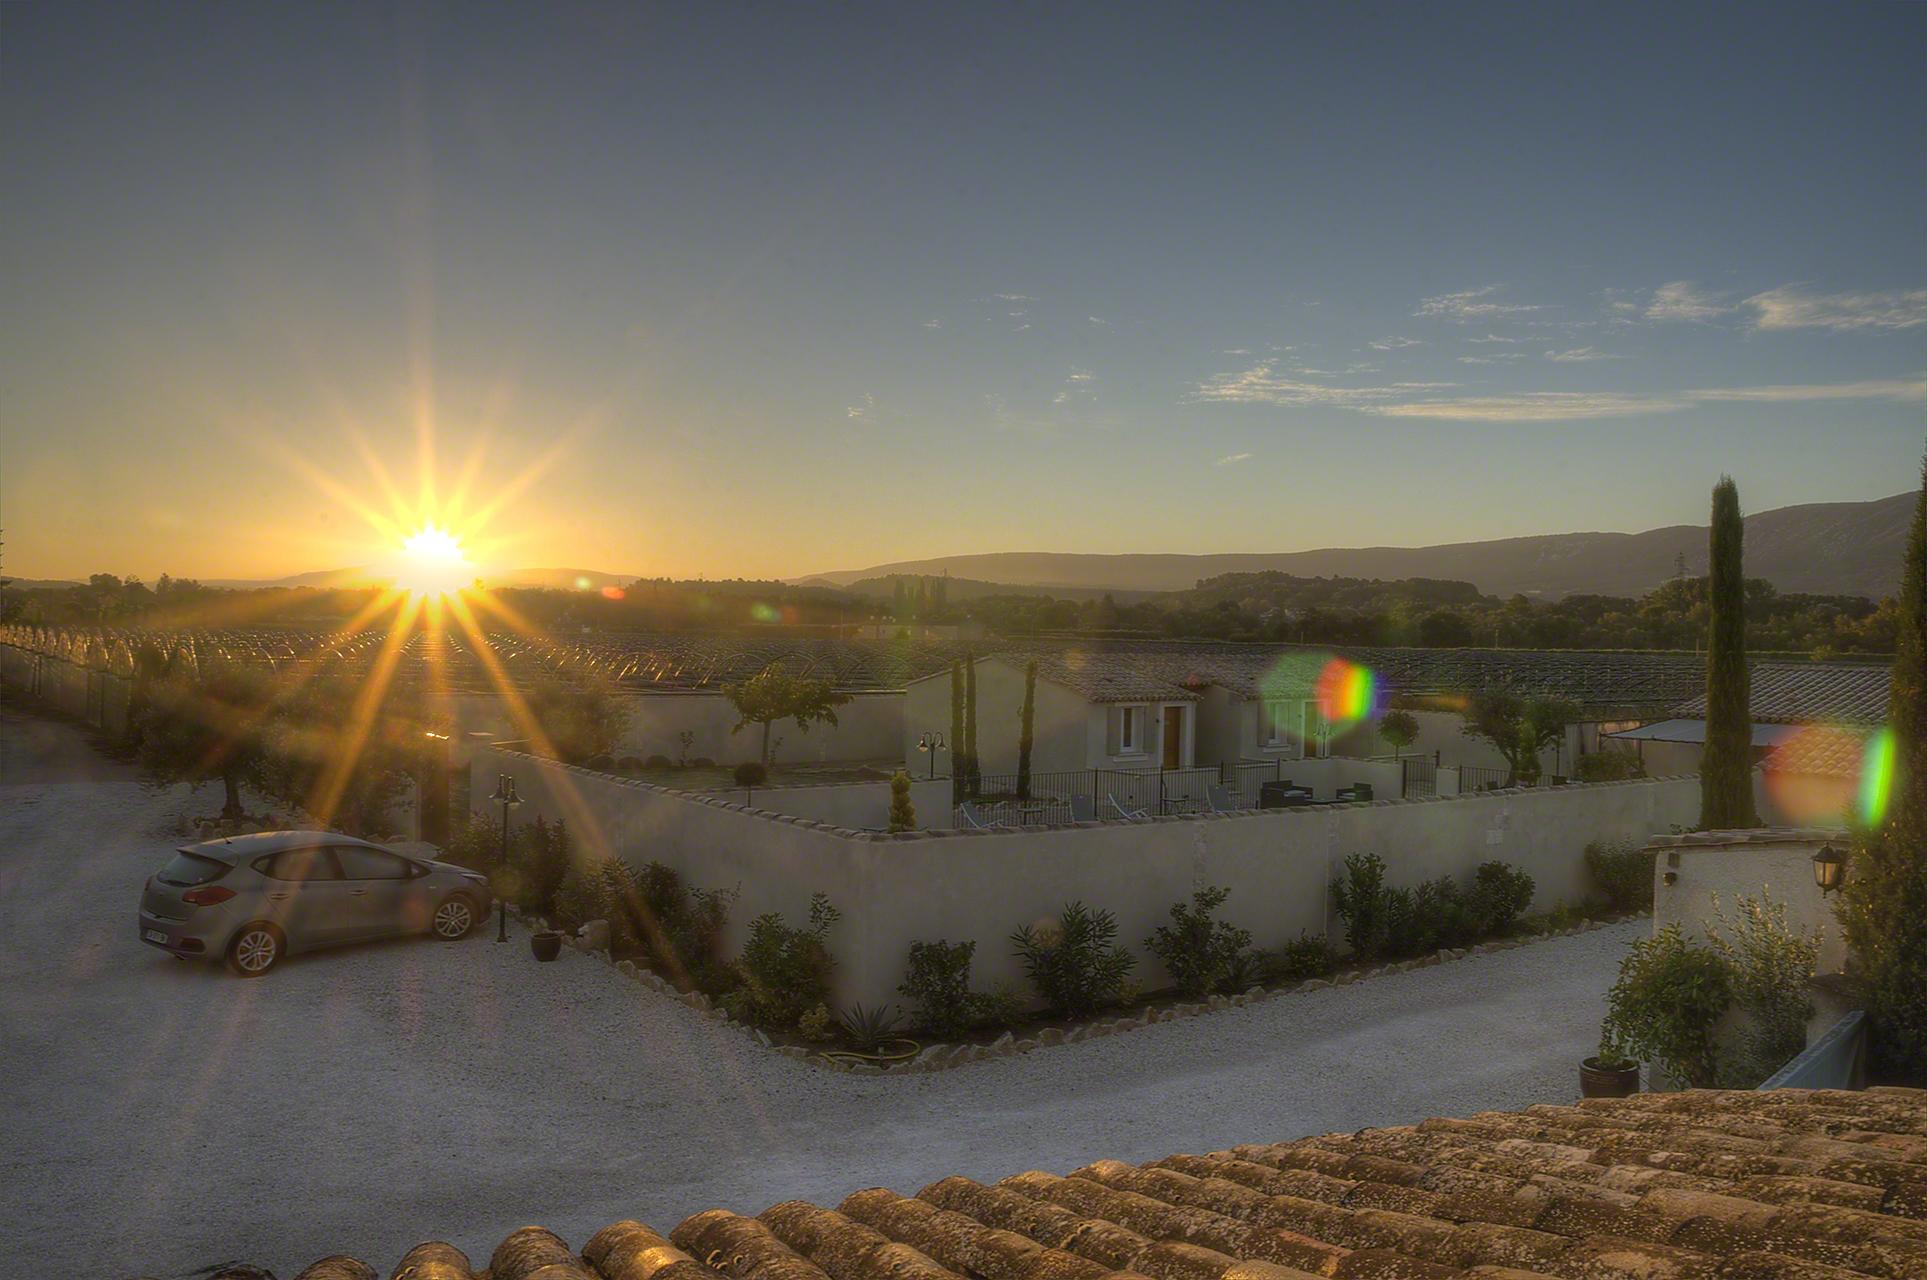 Sunrise in Provence, France